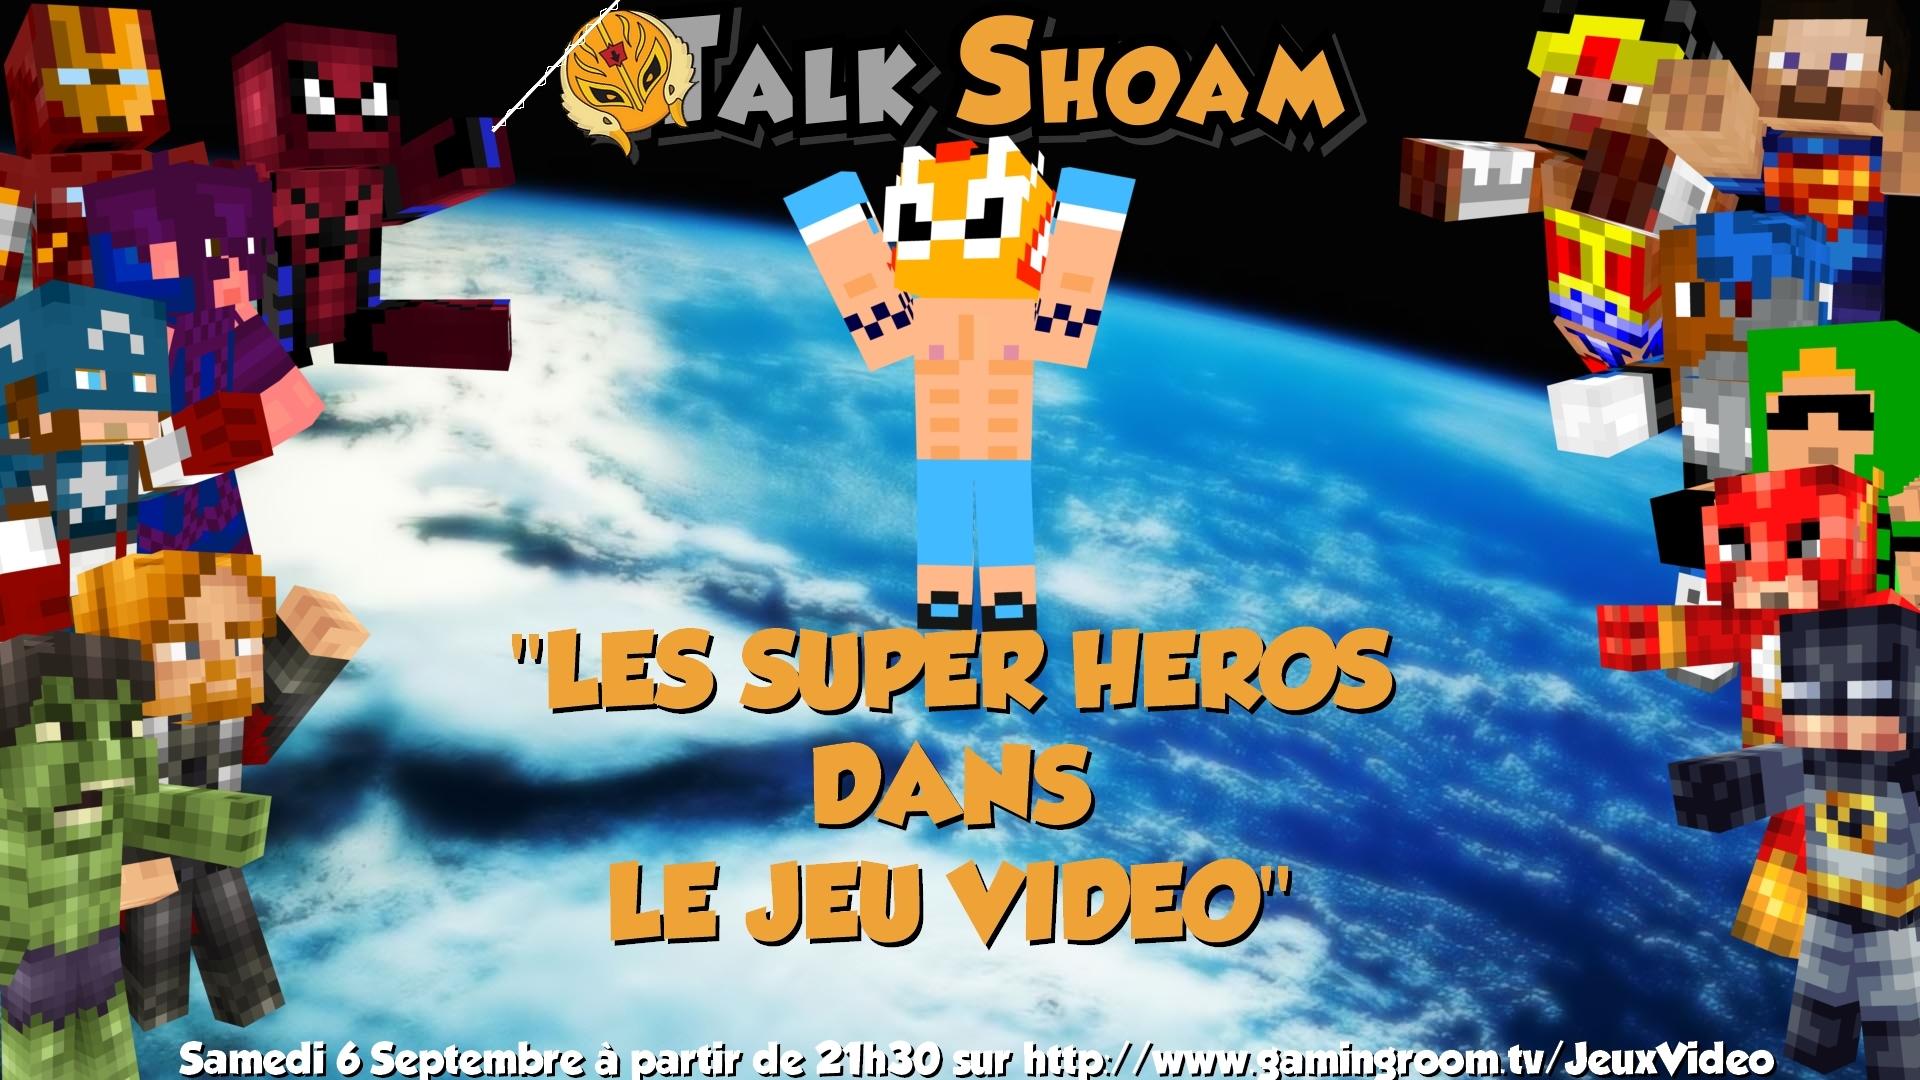 "TalkShoam # 5 ""Les super-héros dans le jeu vidéo"""